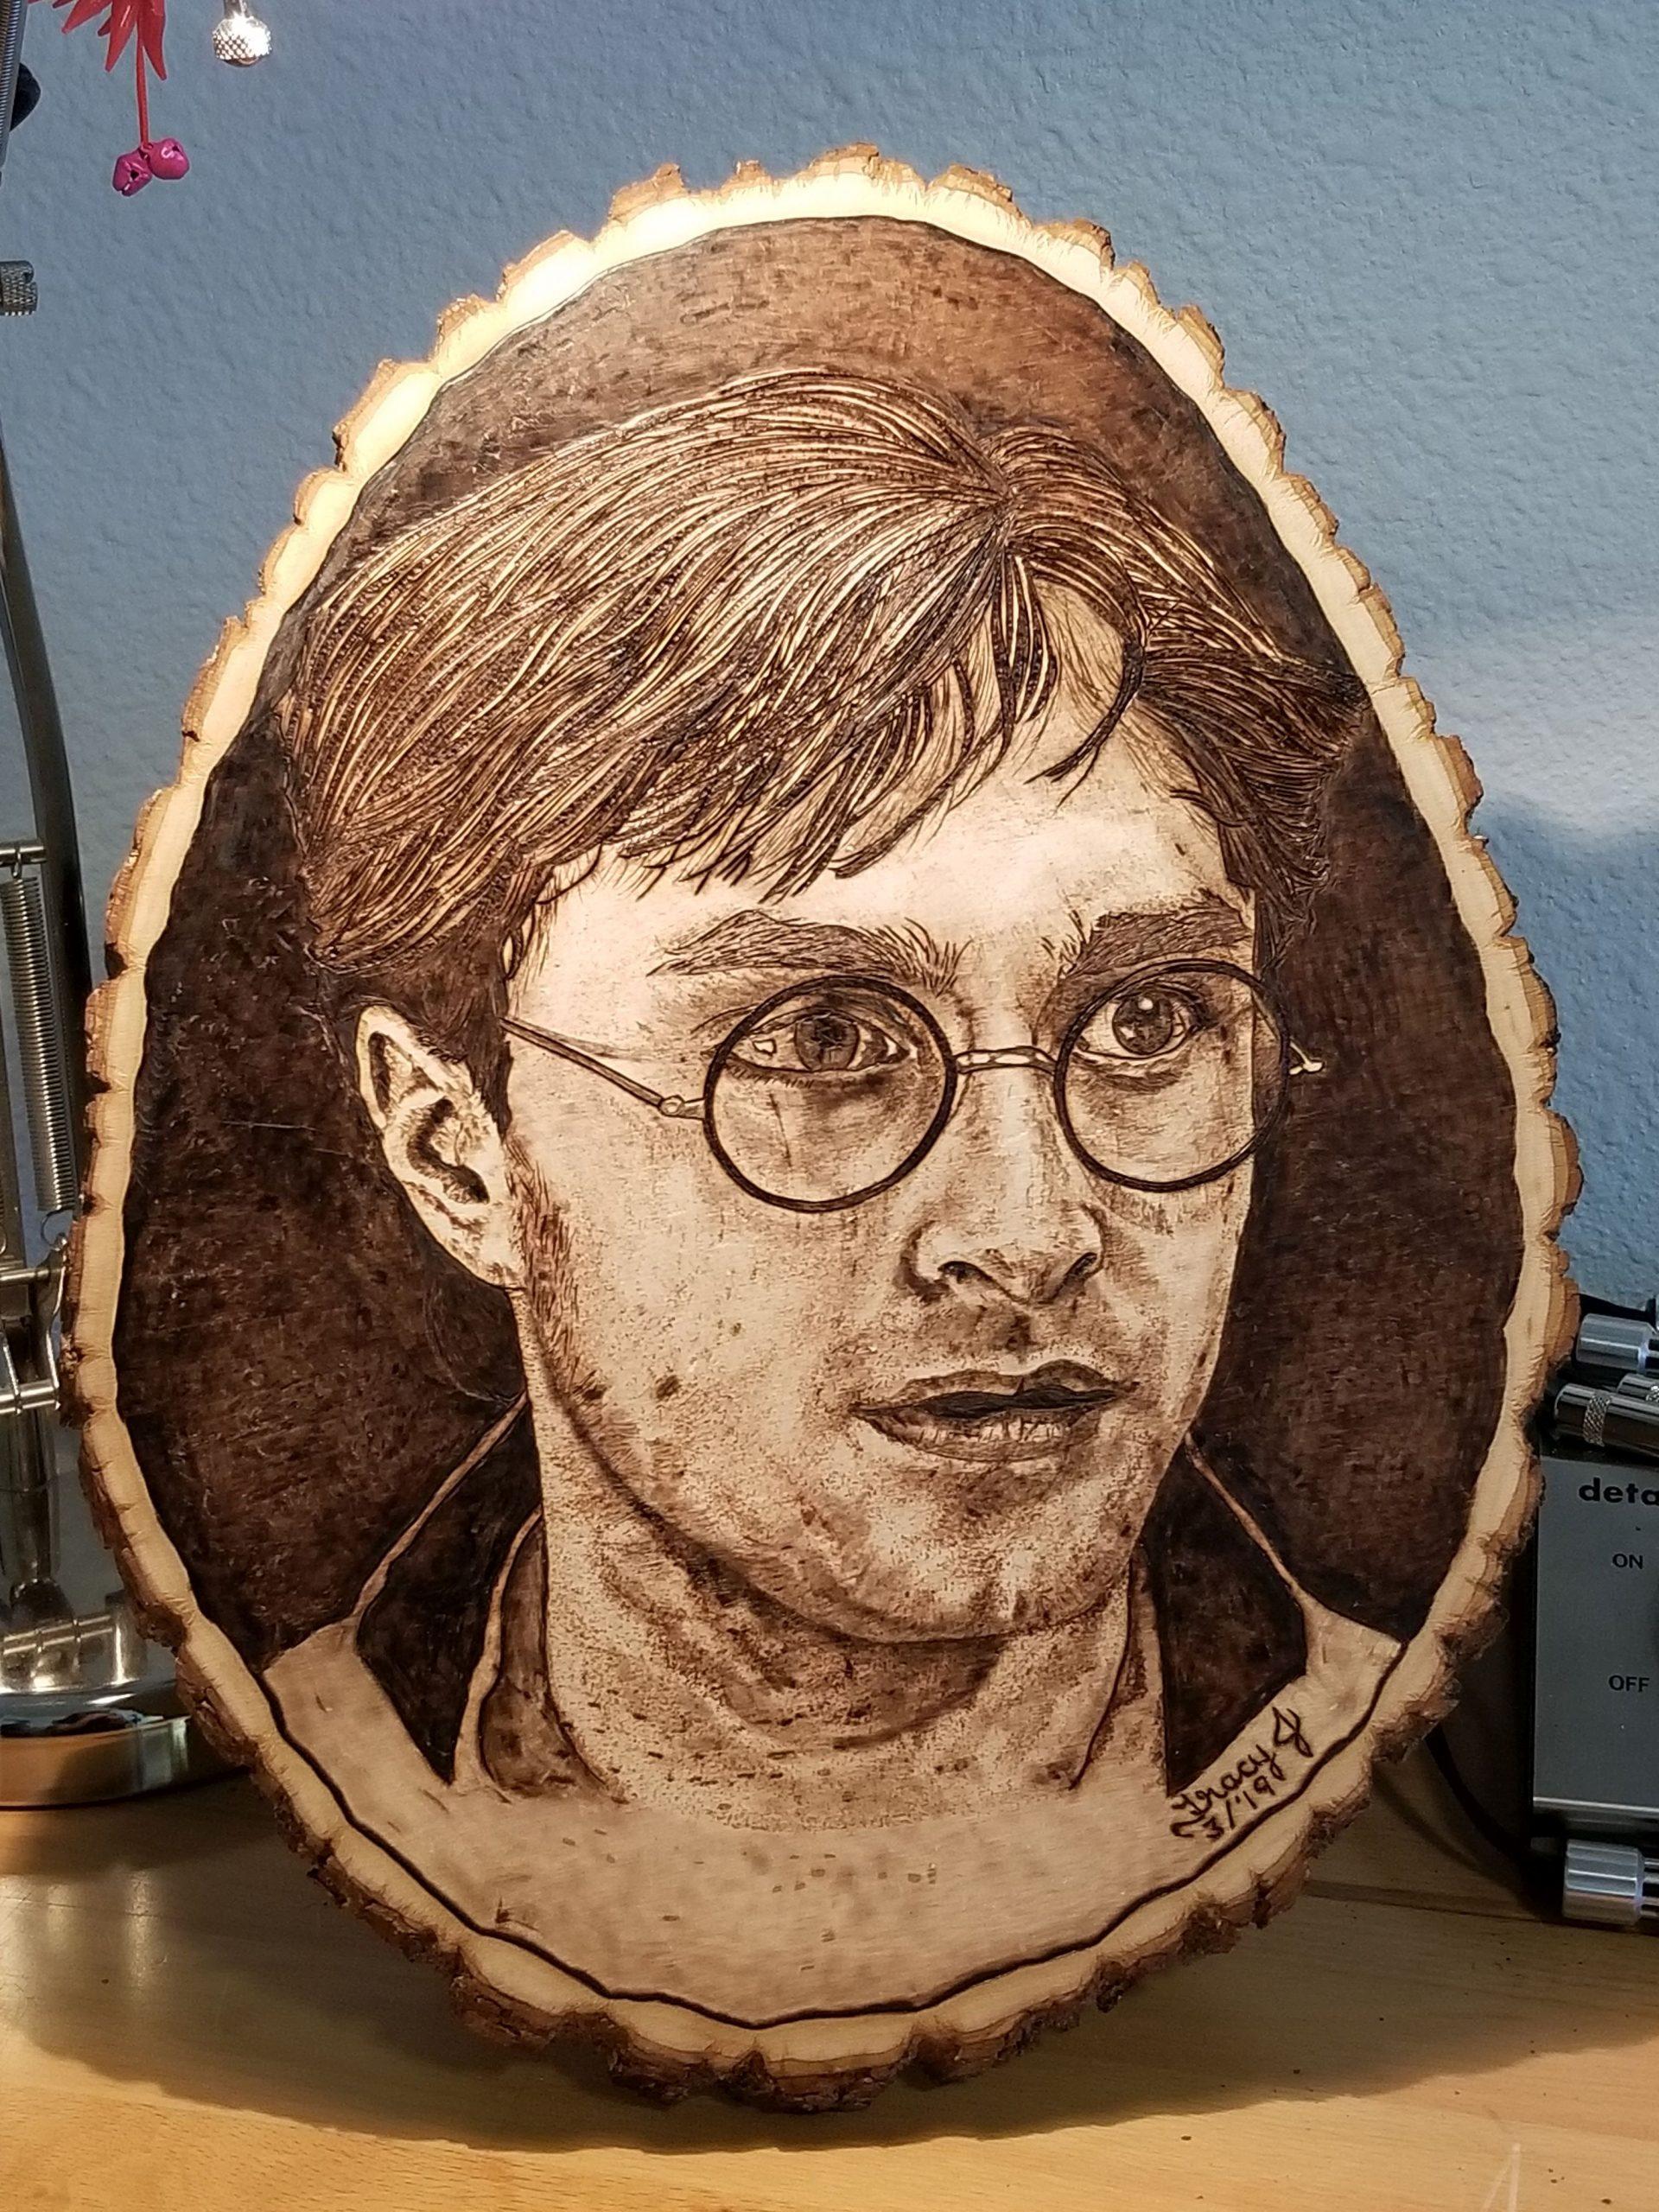 Harry Potter - Finished